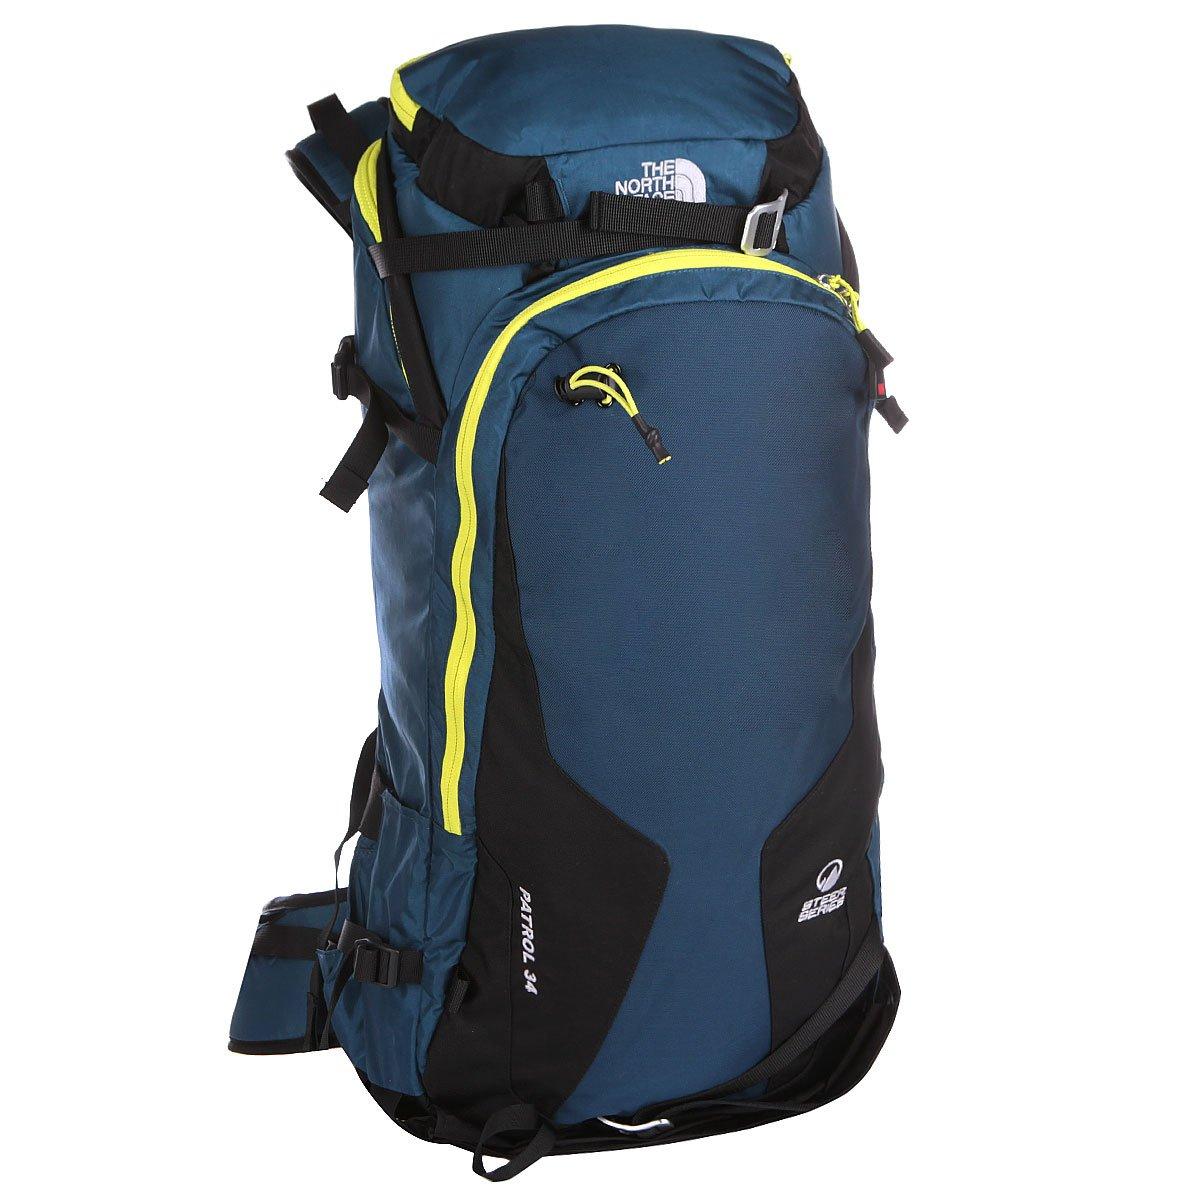 cb14aaae7949 Купить рюкзак спортивный The North Face Patrol Mon Blue Ssp Green в ...